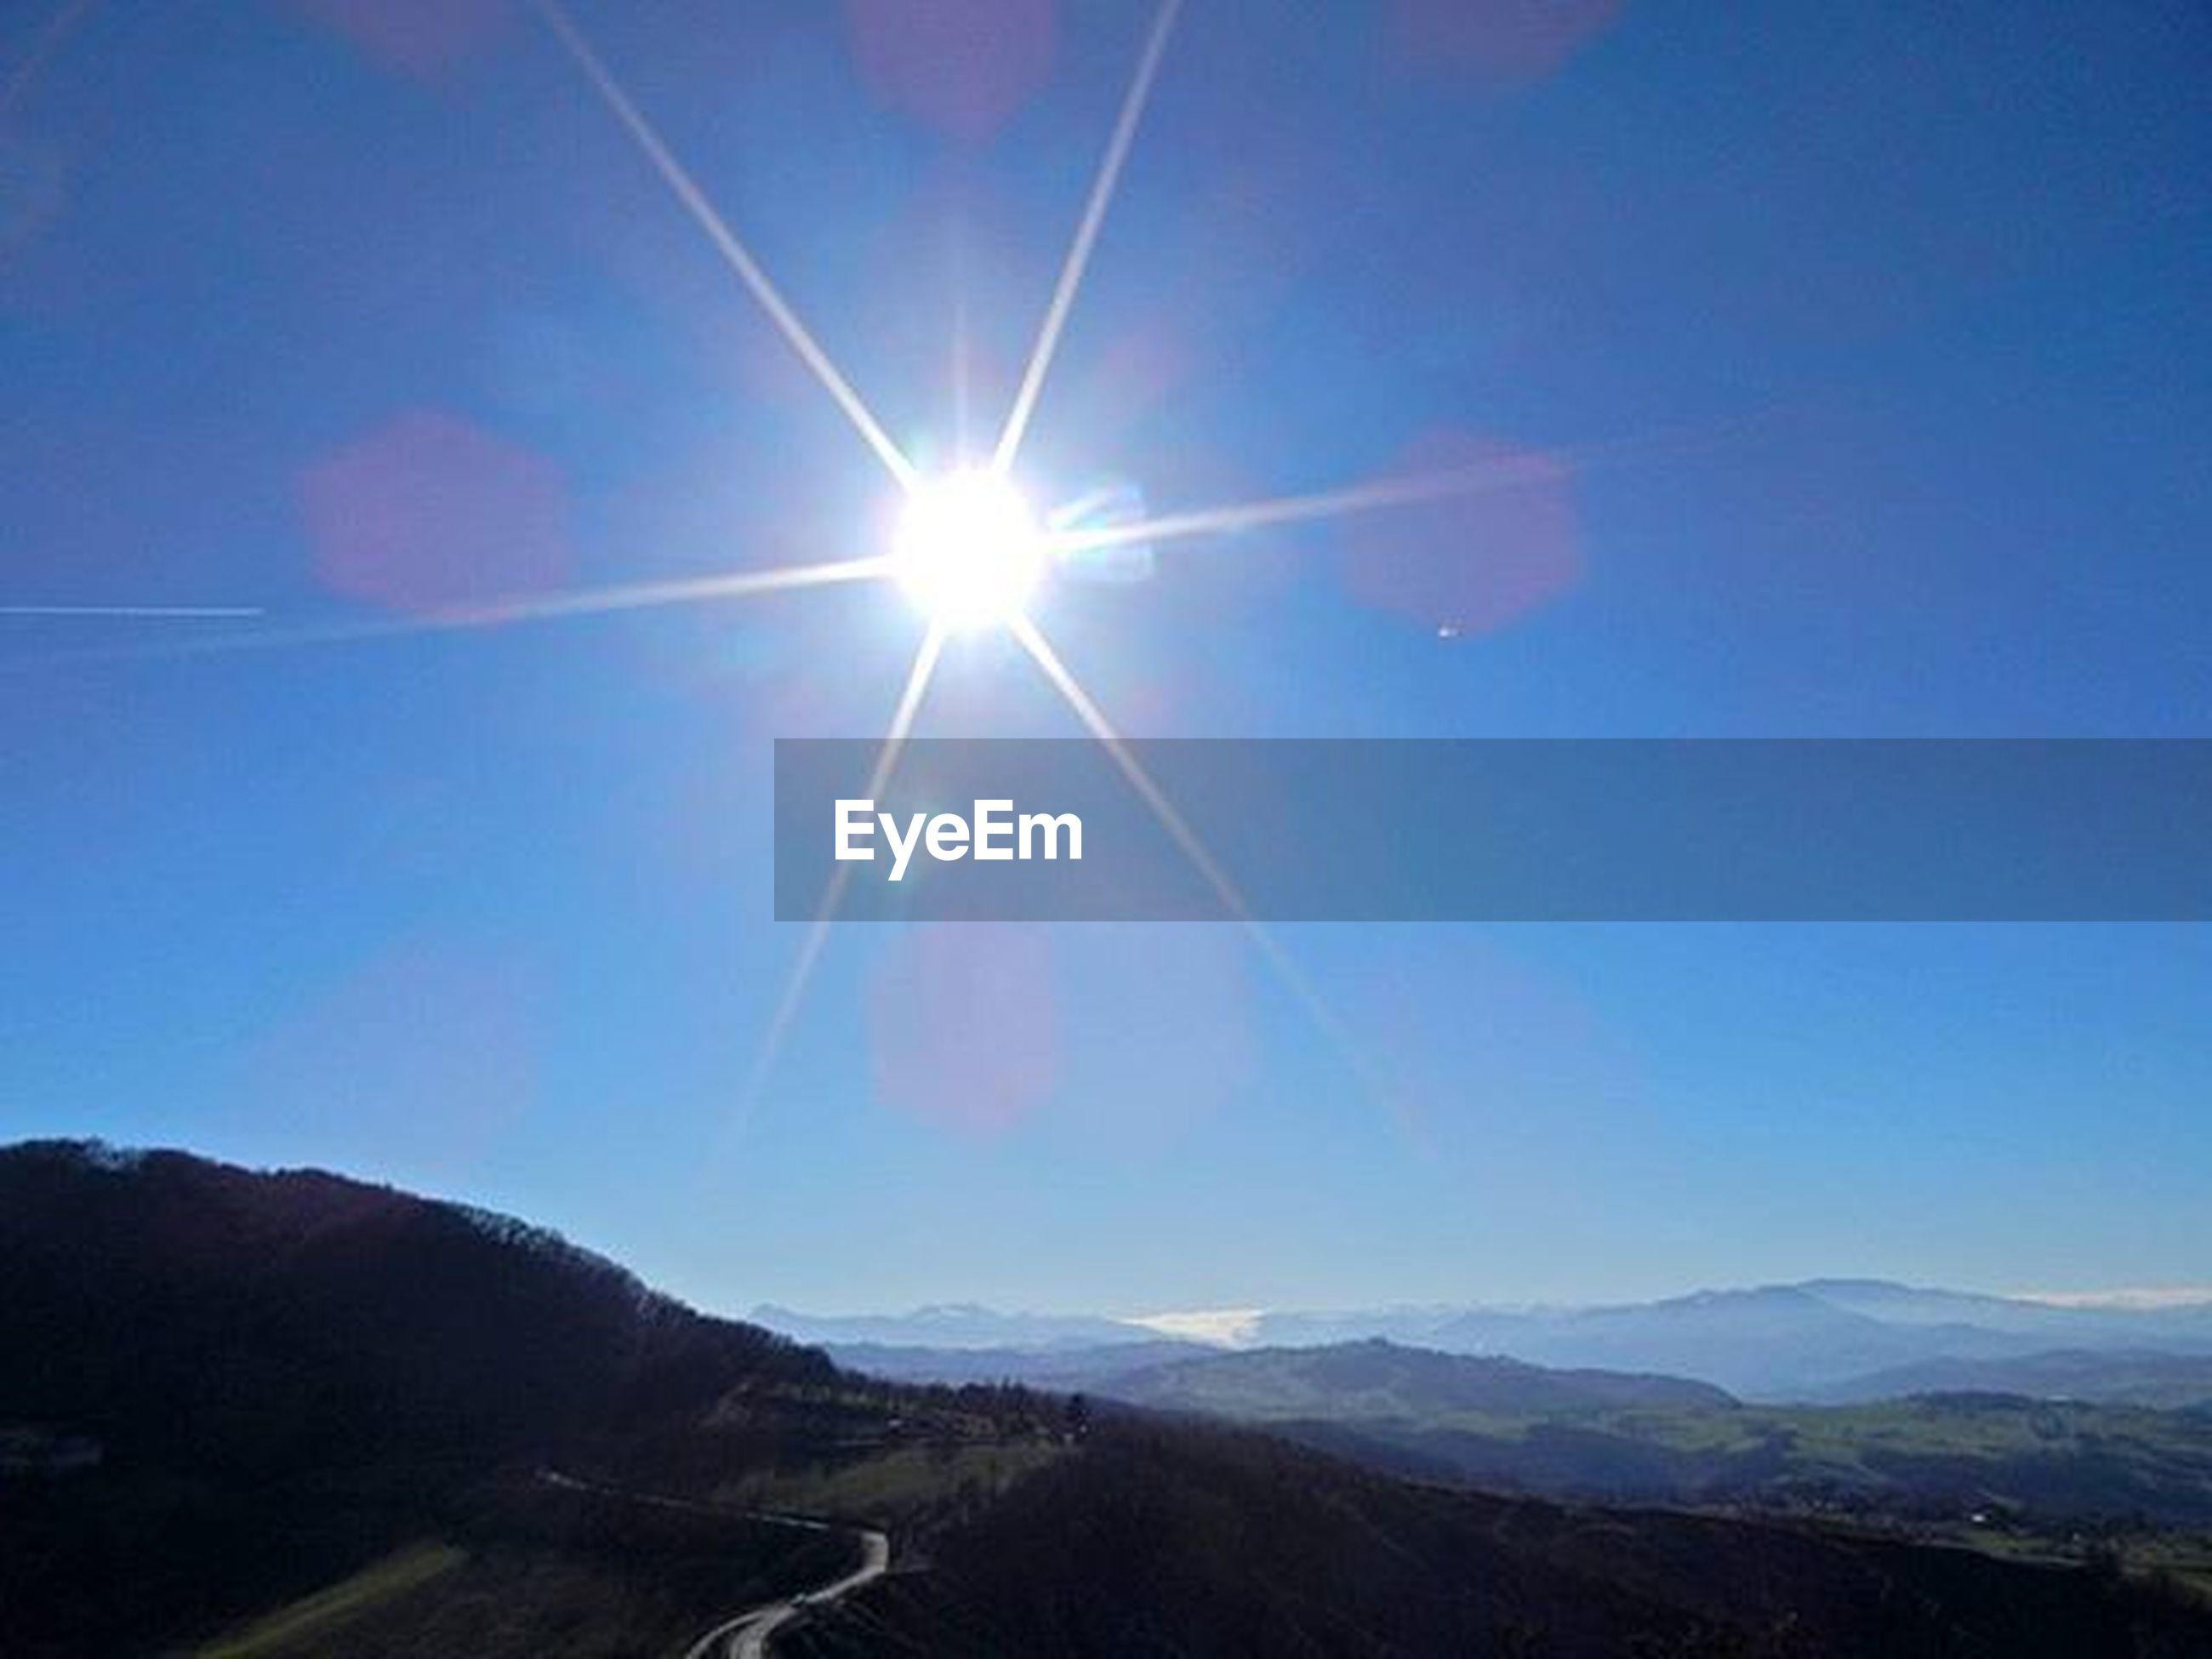 sun, mountain, sunbeam, sunlight, blue, tranquility, lens flare, tranquil scene, mountain range, scenics, landscape, beauty in nature, nature, sunny, sky, bright, clear sky, non-urban scene, day, snow